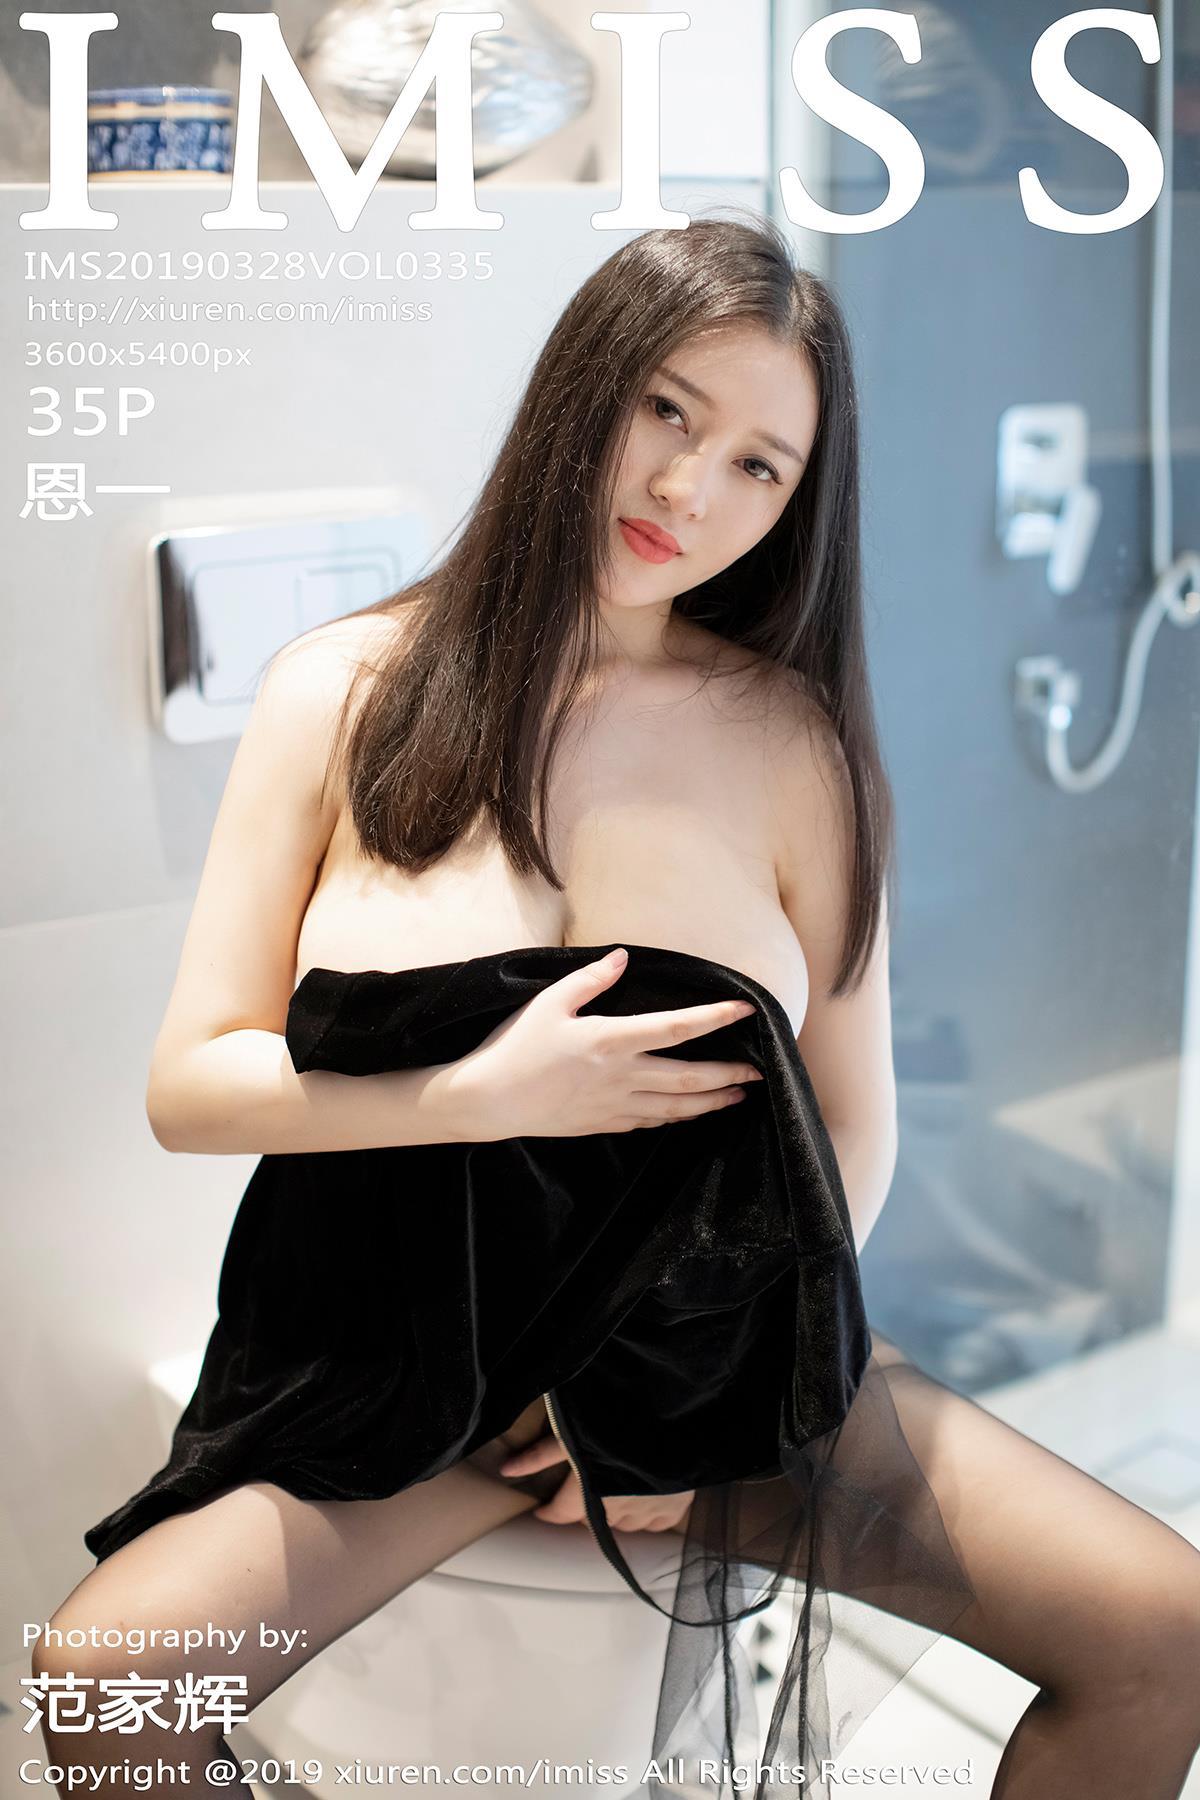 [IMISS爱蜜社]IMS20190328VOL0335 恩一 黑色抹胸裙加黑色丝袜美腿与白色衬衫湿身诱惑性感私房写真集